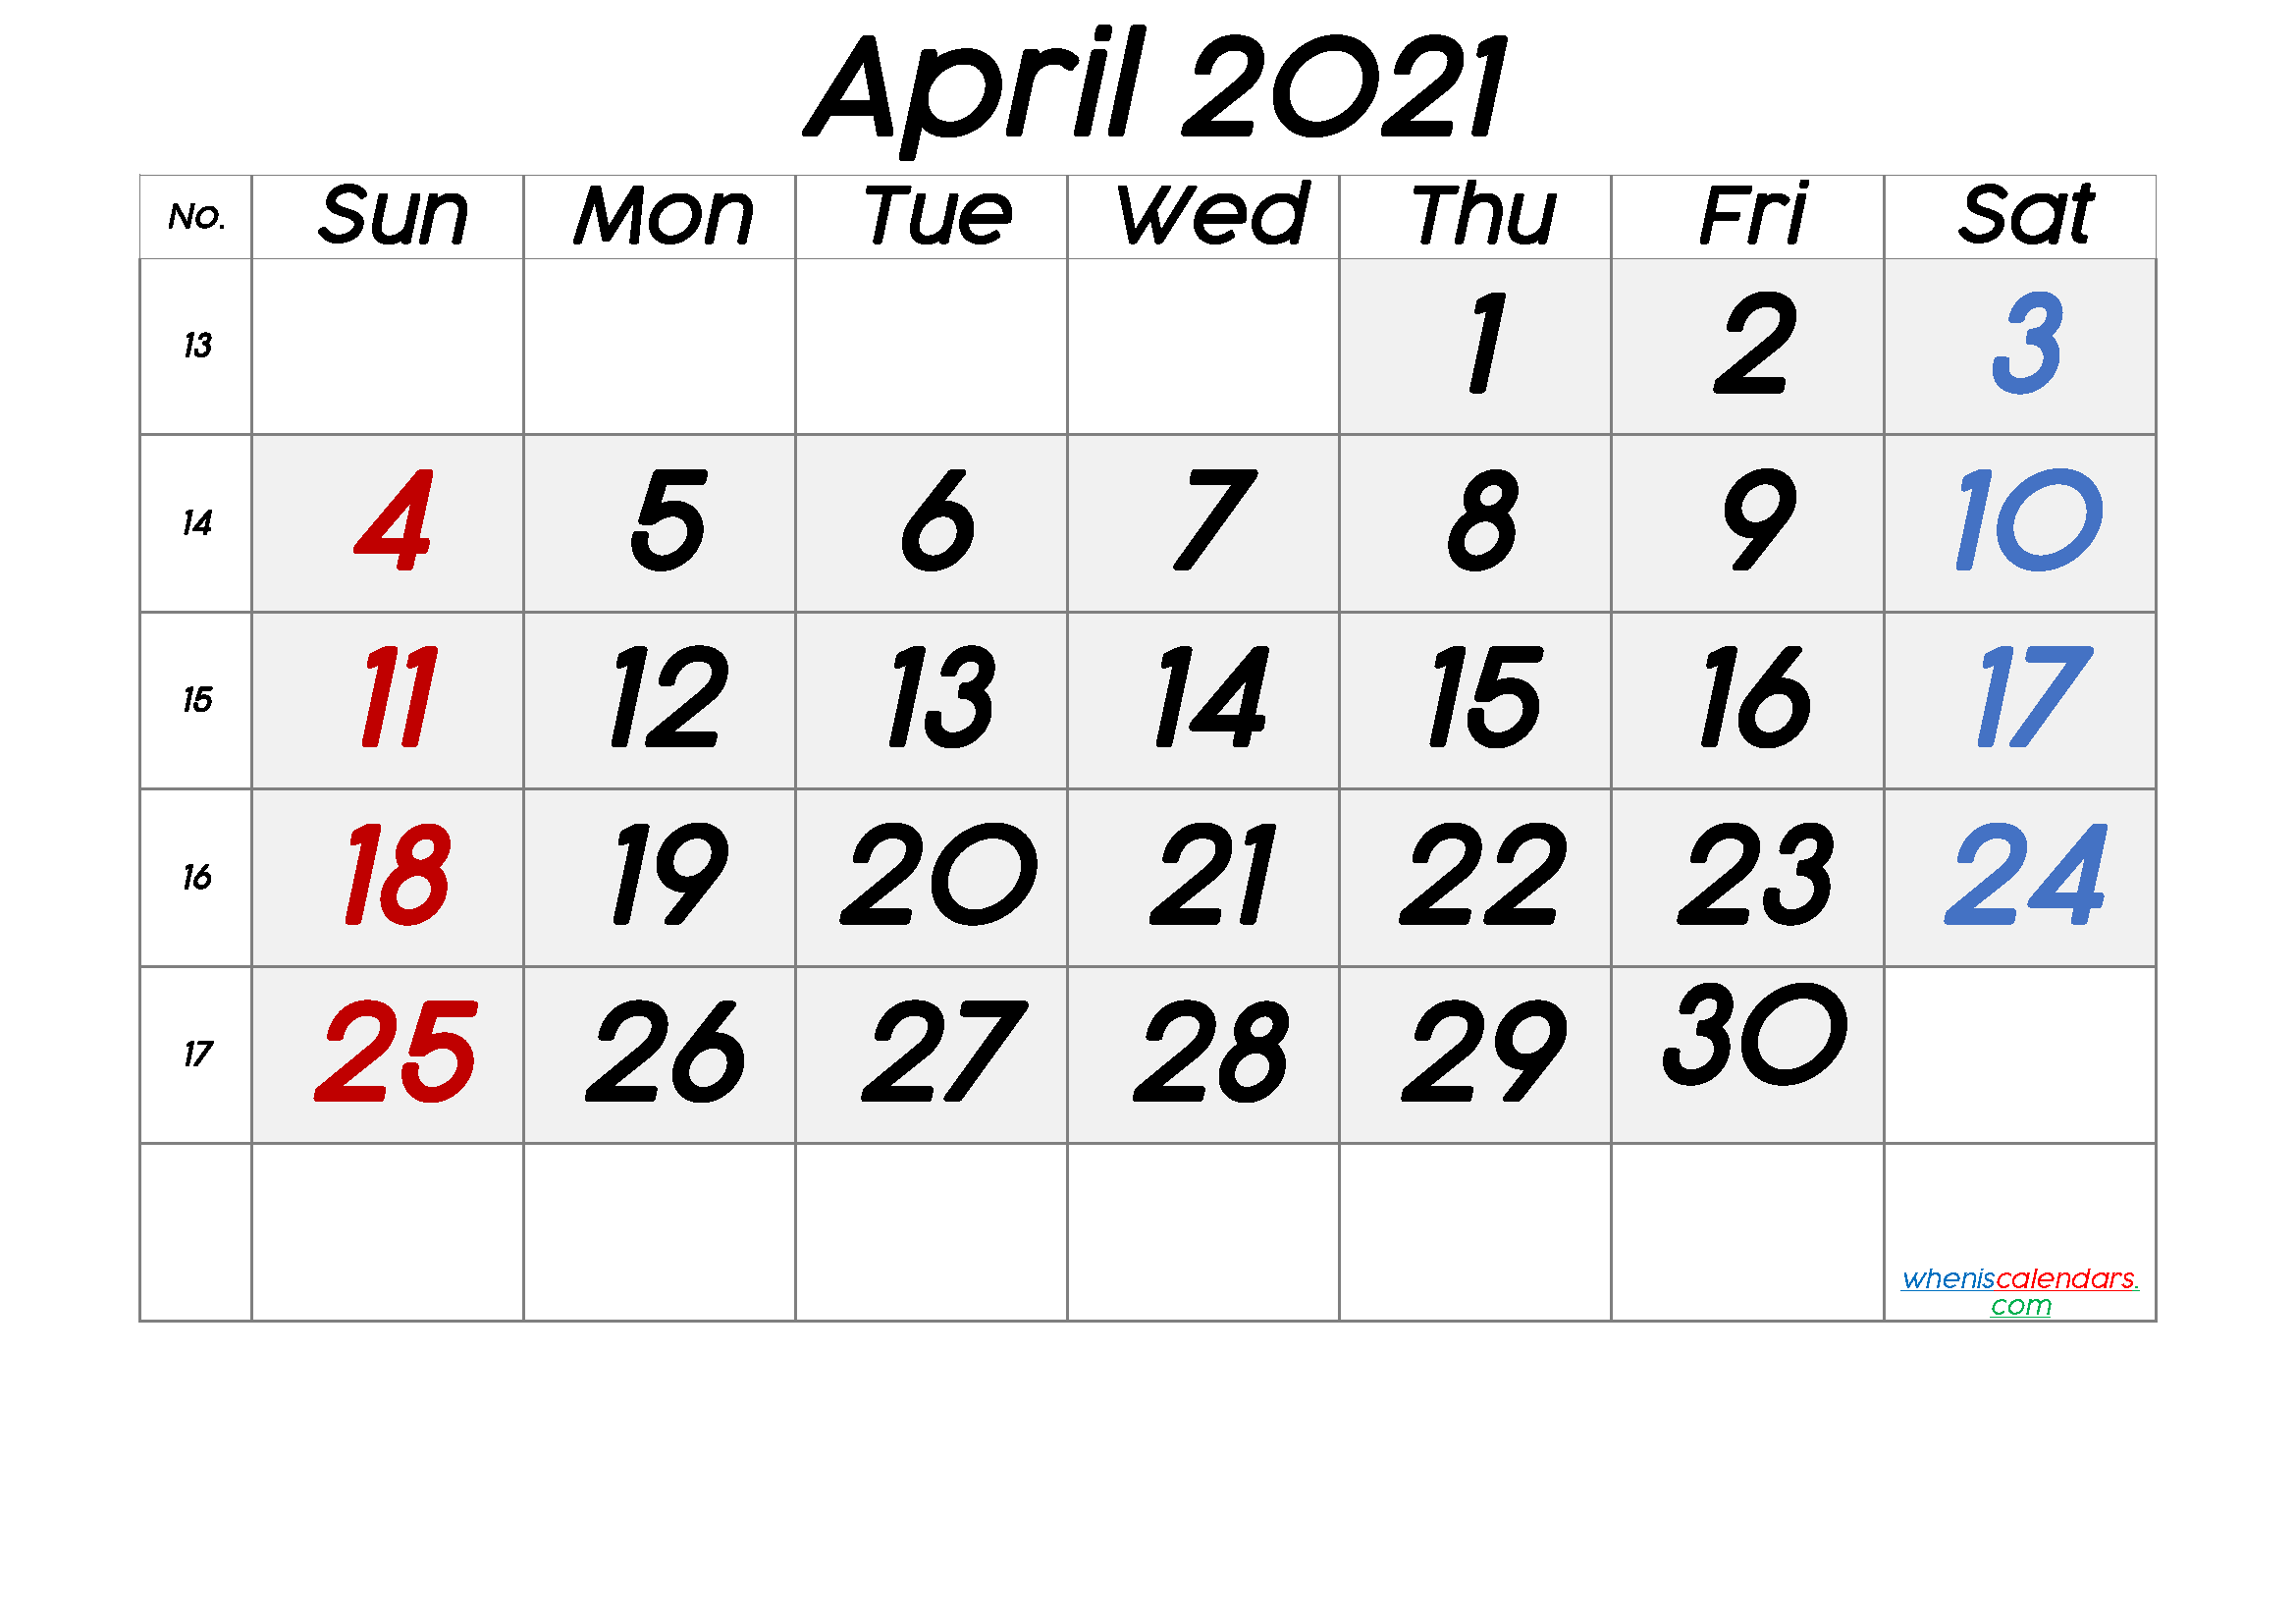 April 2021 Printable Calendar